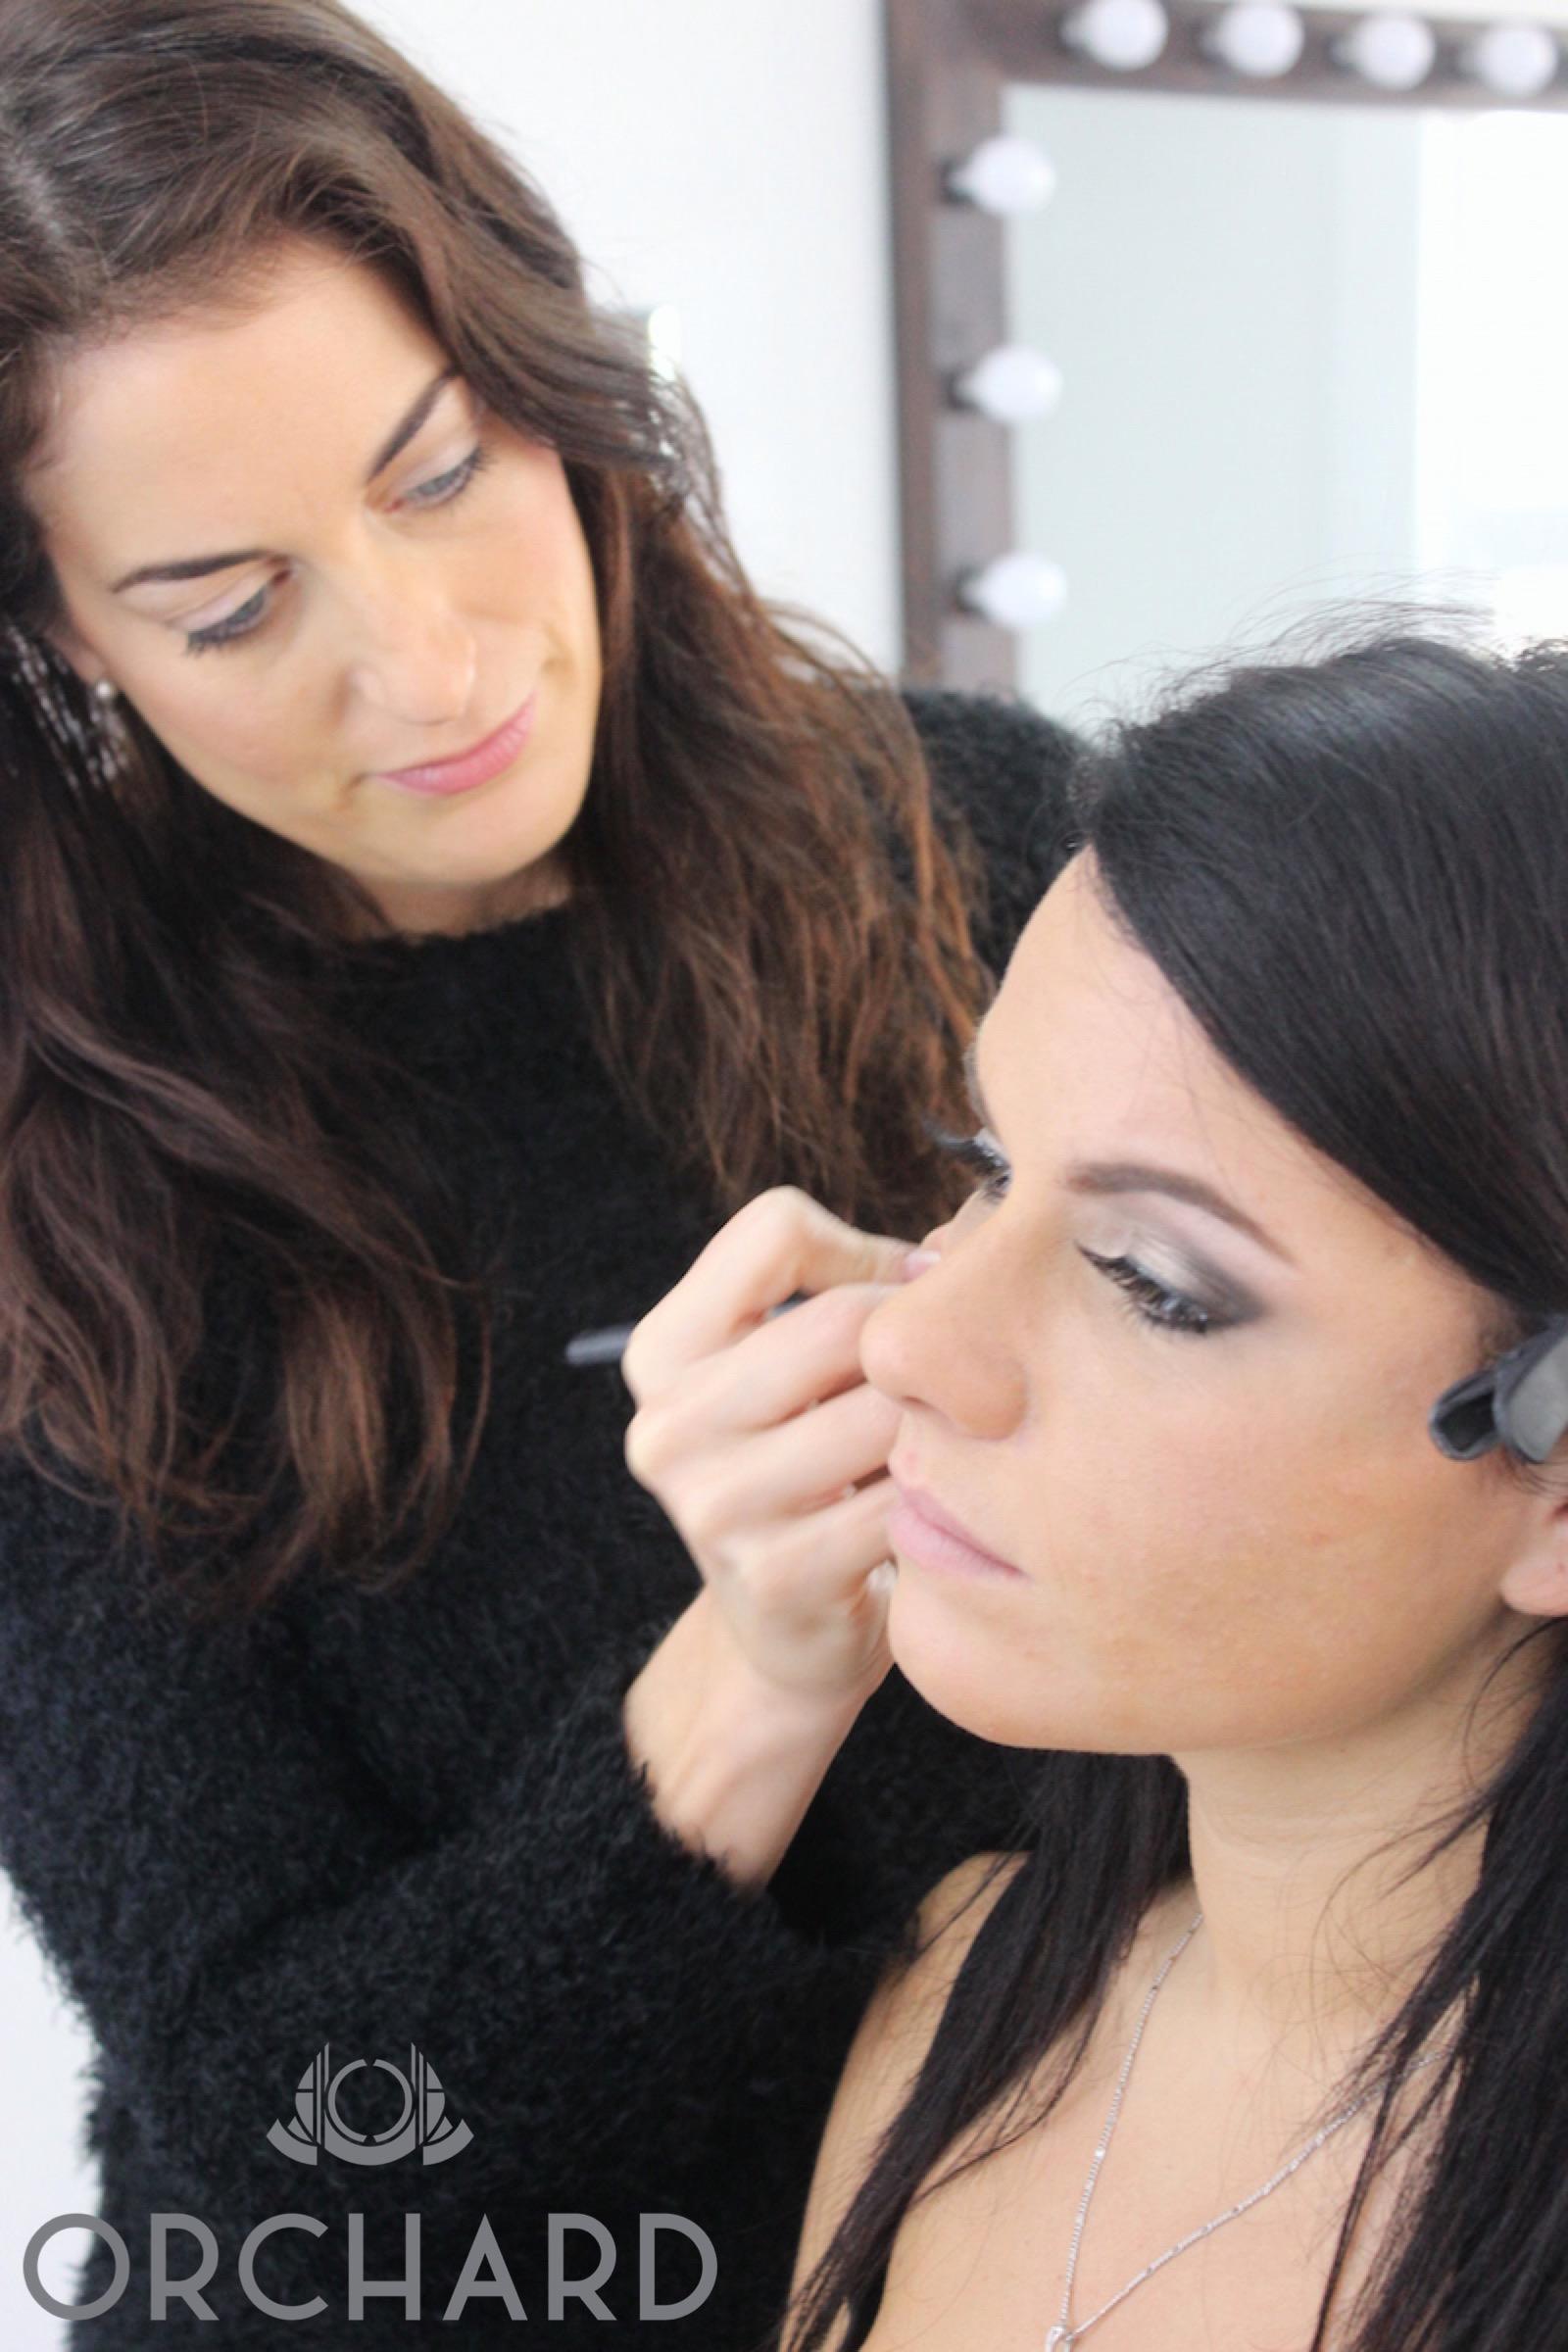 Sally-Orchard-Orchard-makeup-studio